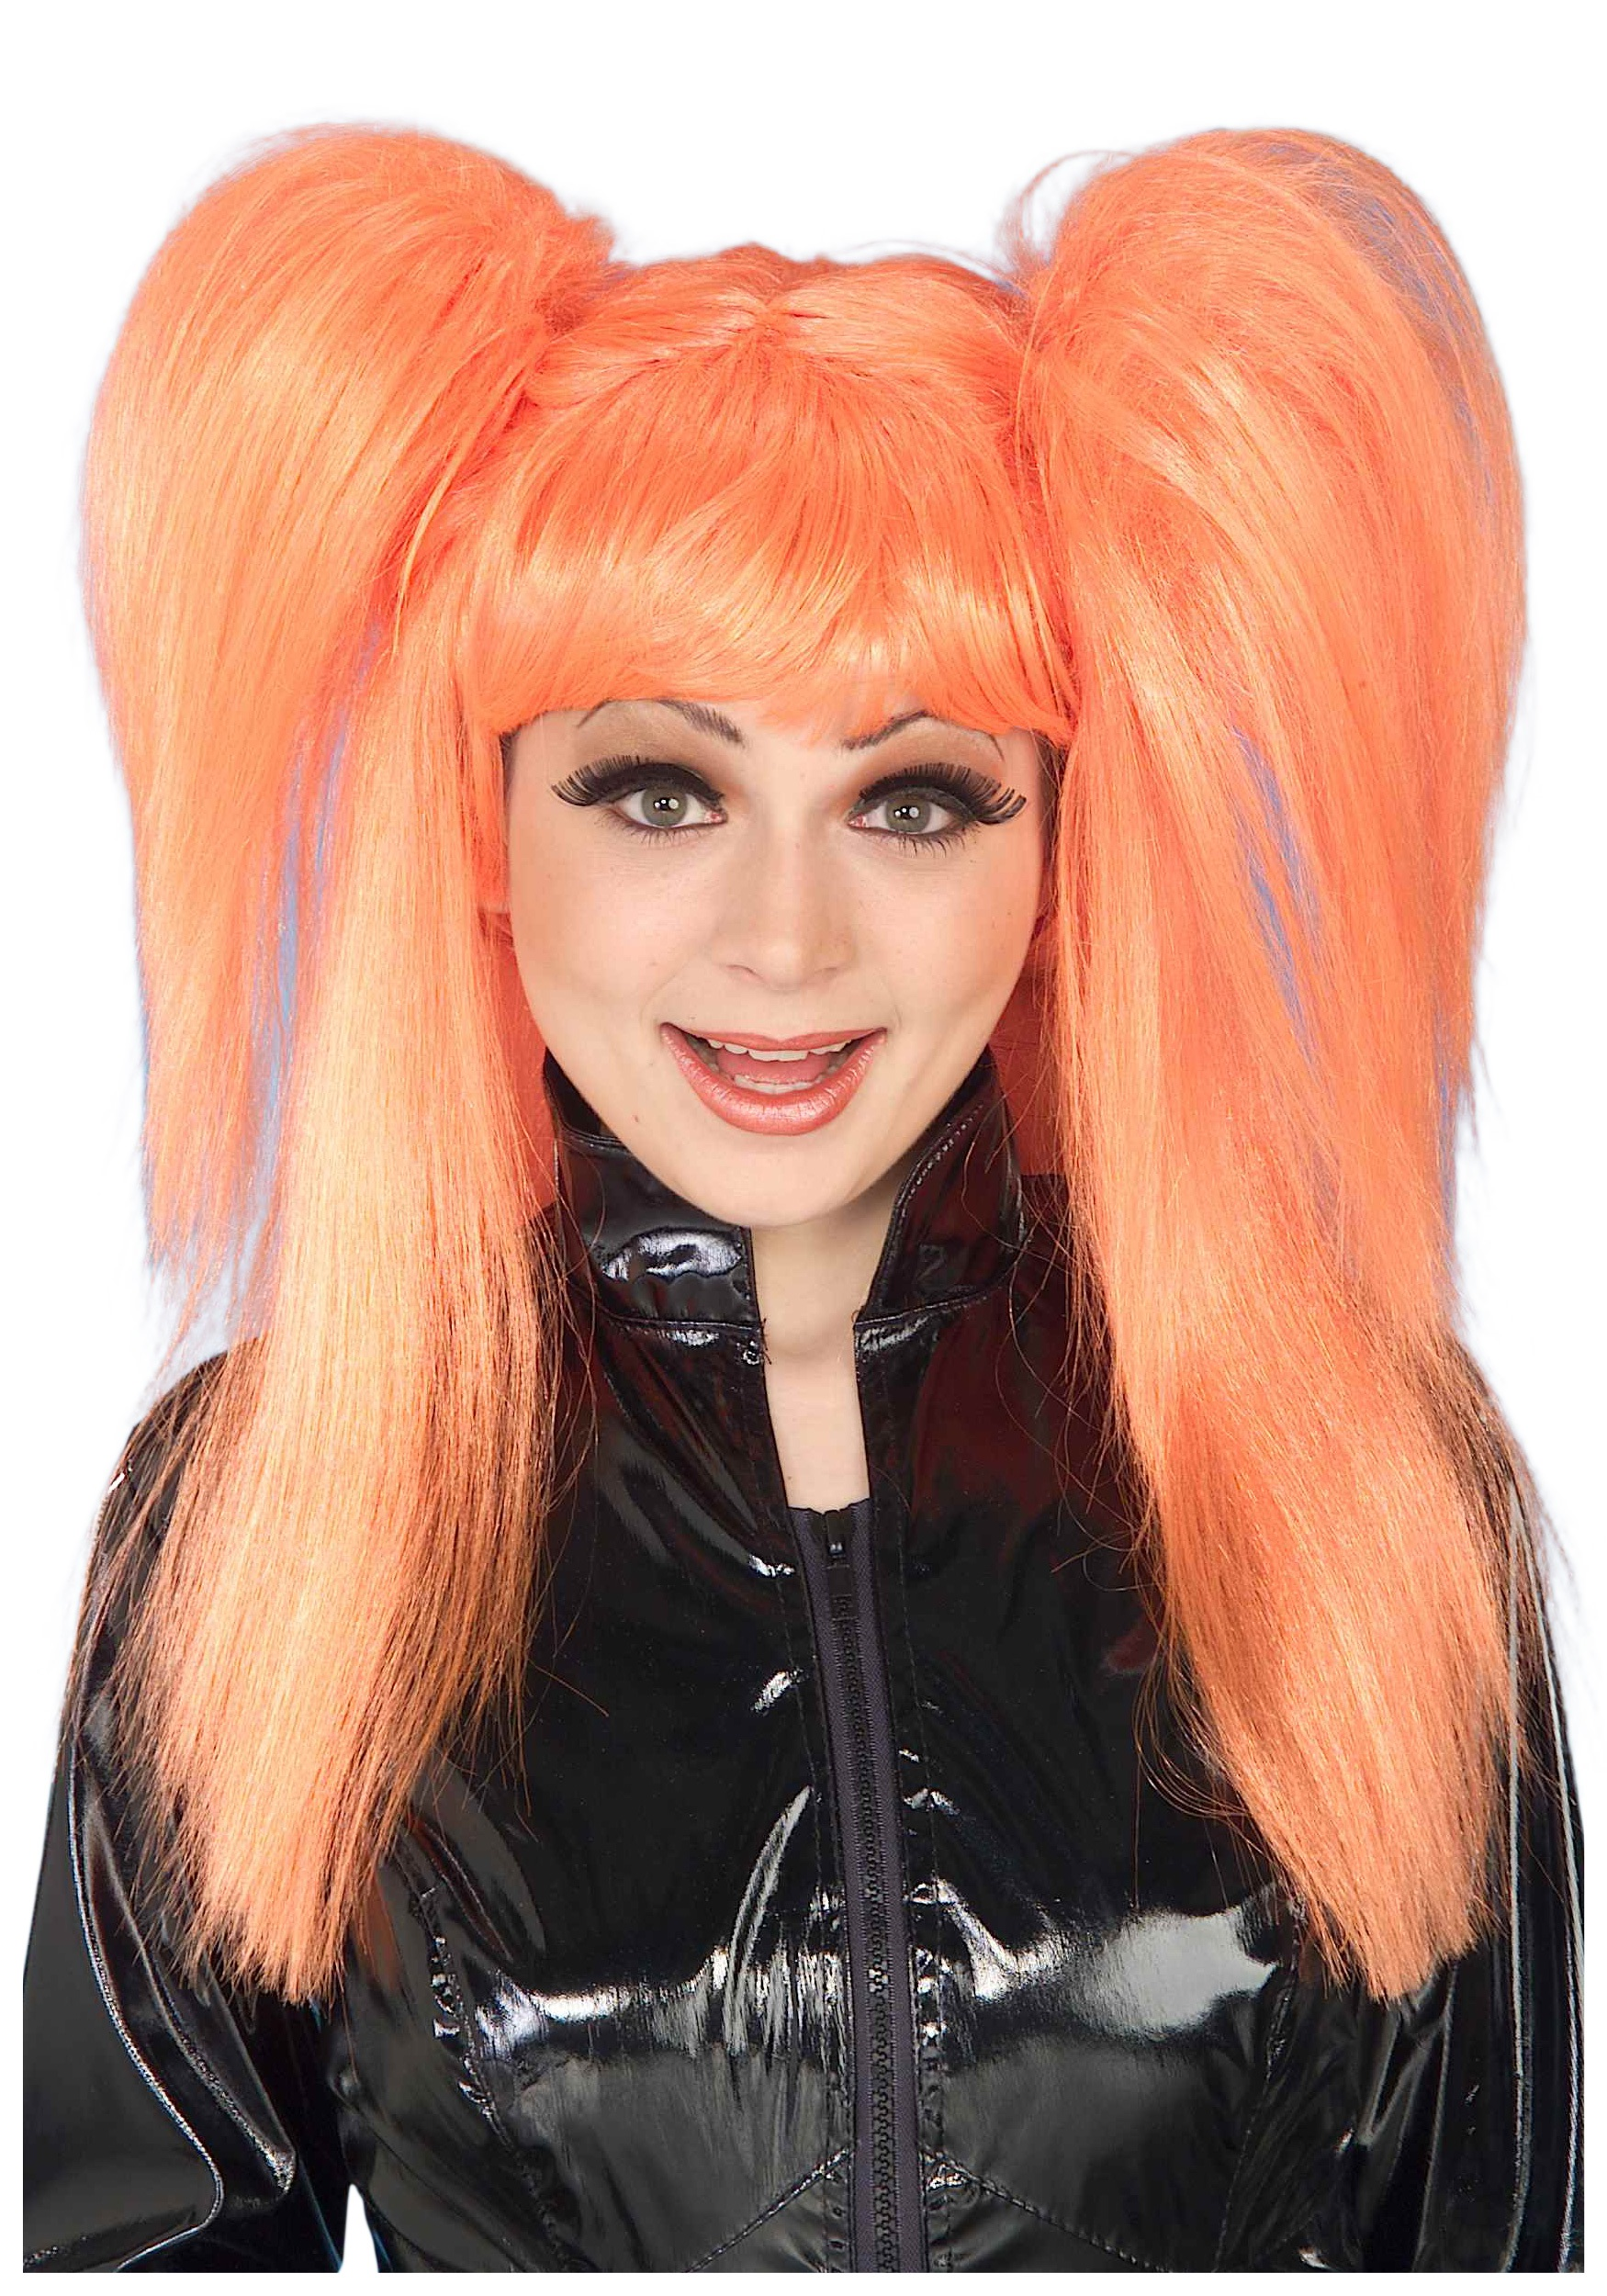 womens-clown-wig.jpg bc3b6af7e7